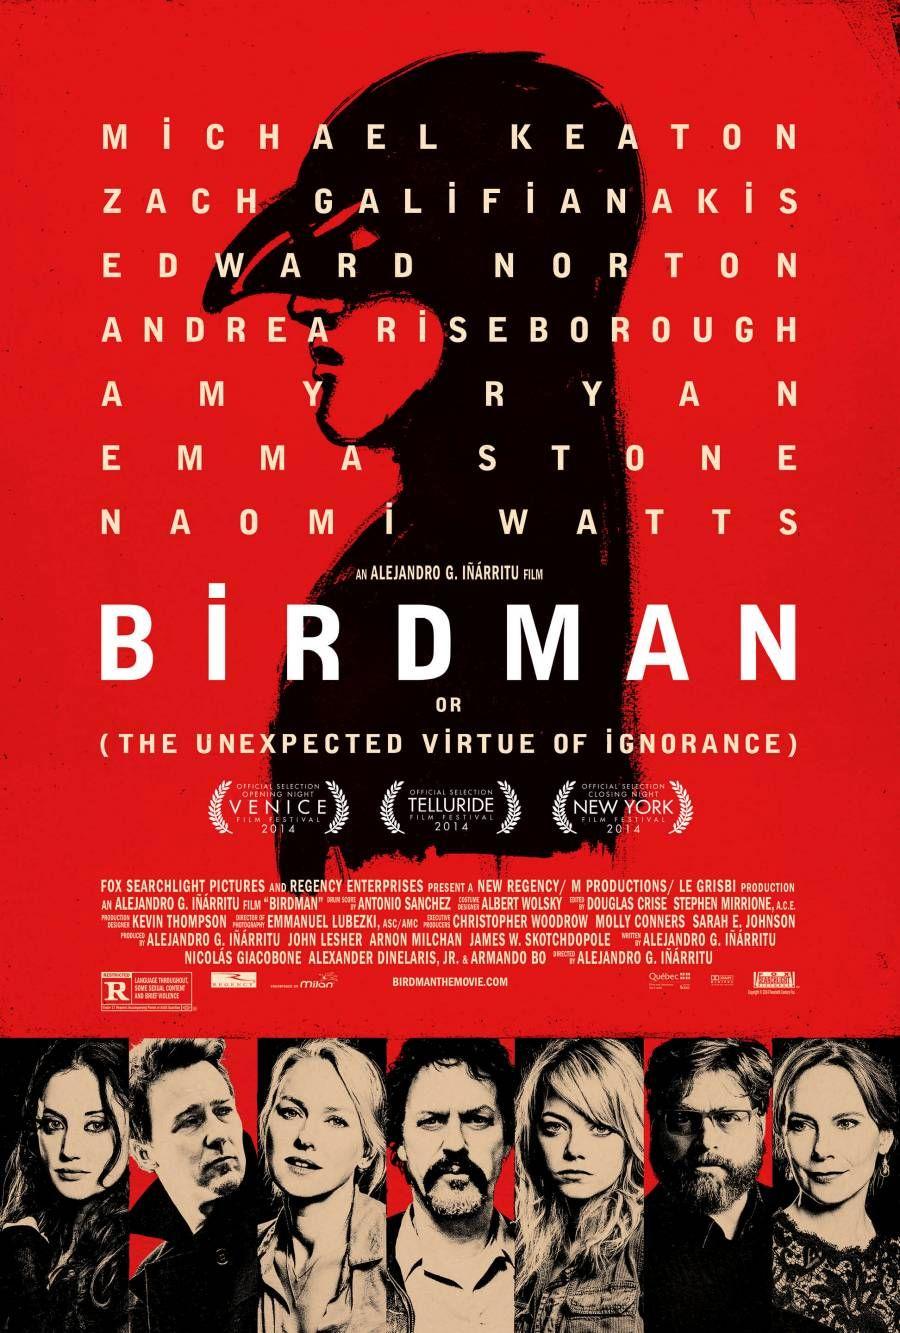 Birdman: New poster released for Michael Keaton film ...